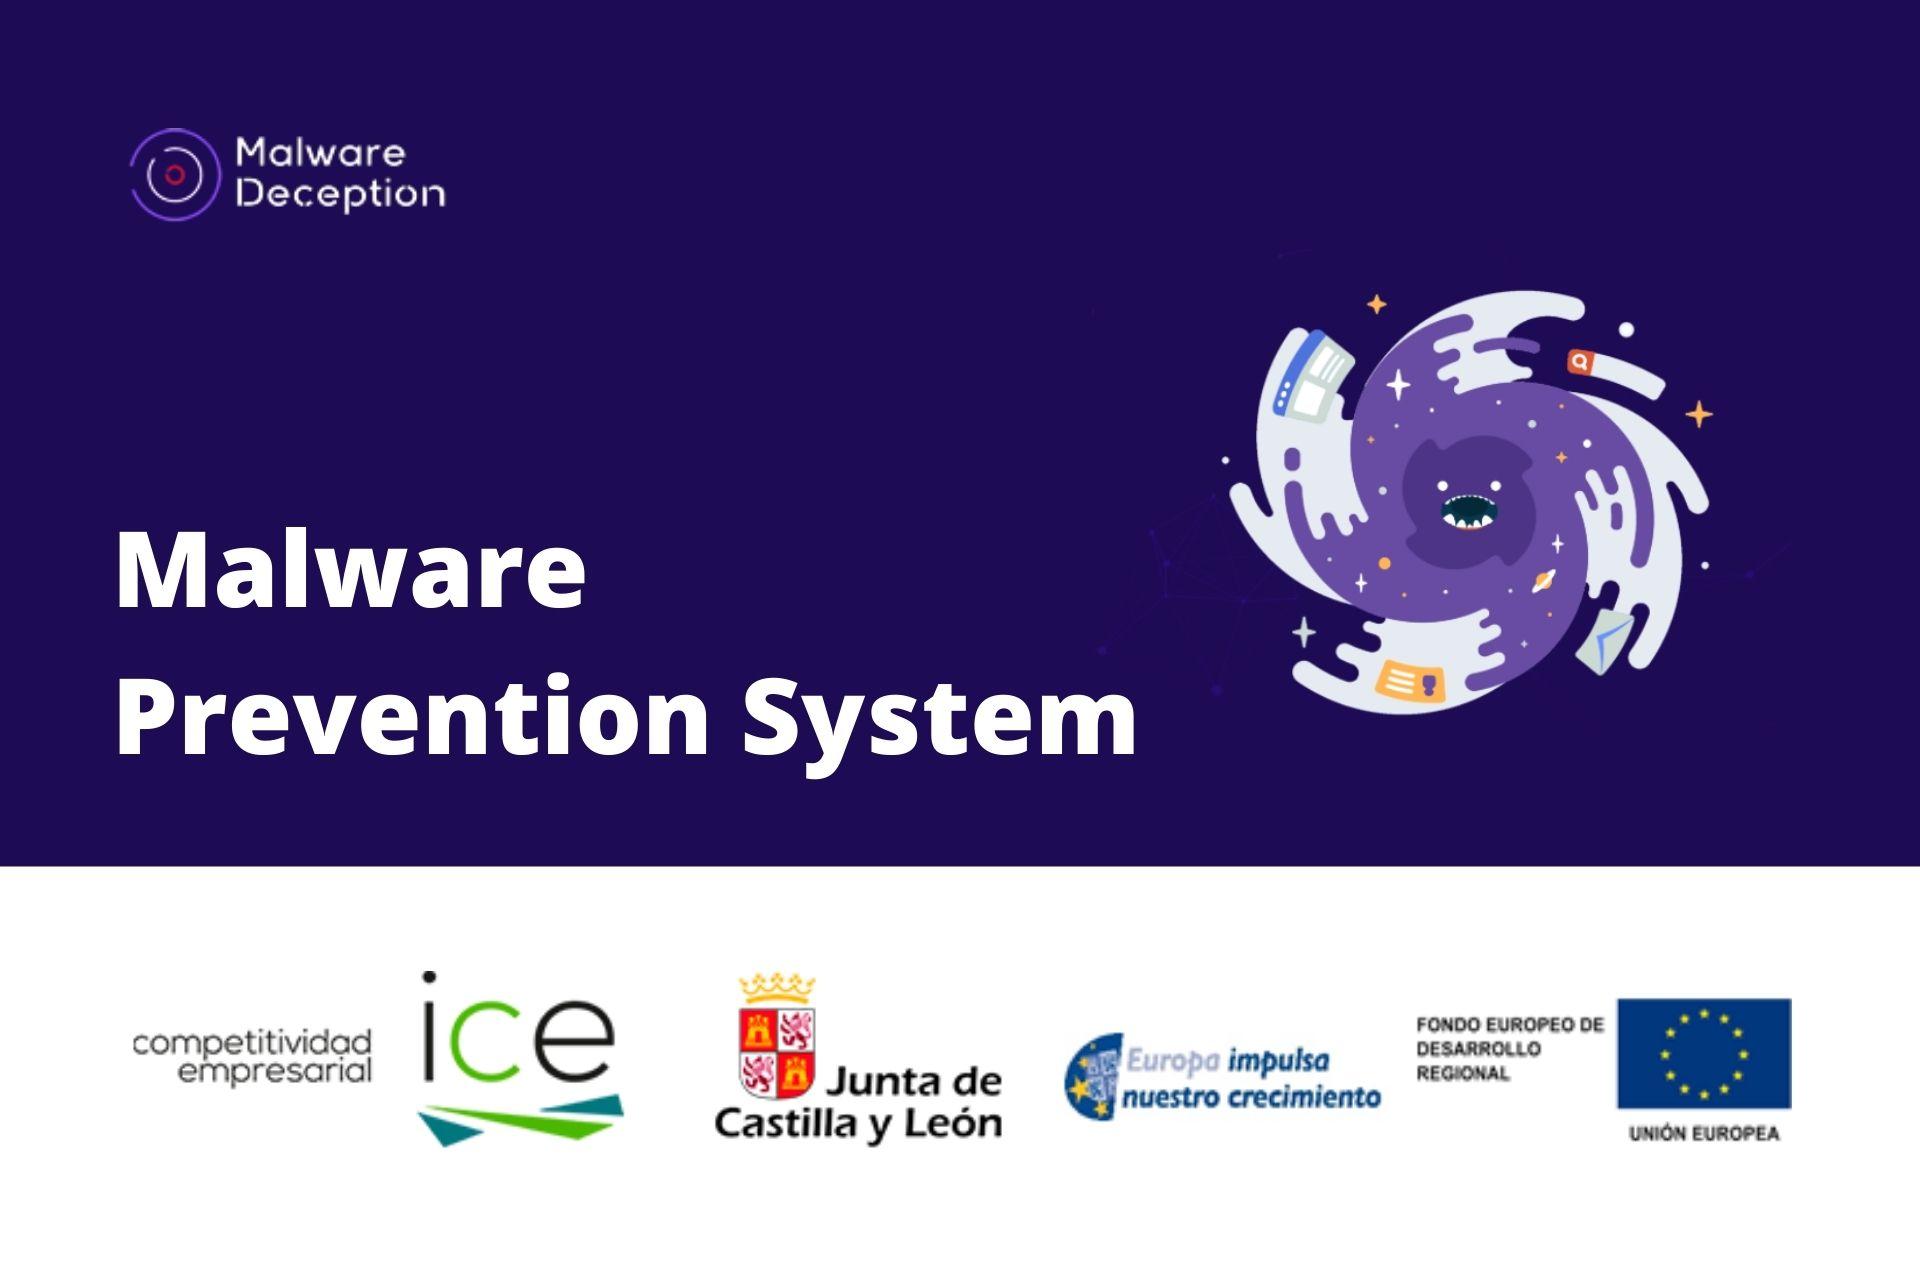 Malware Prevention System